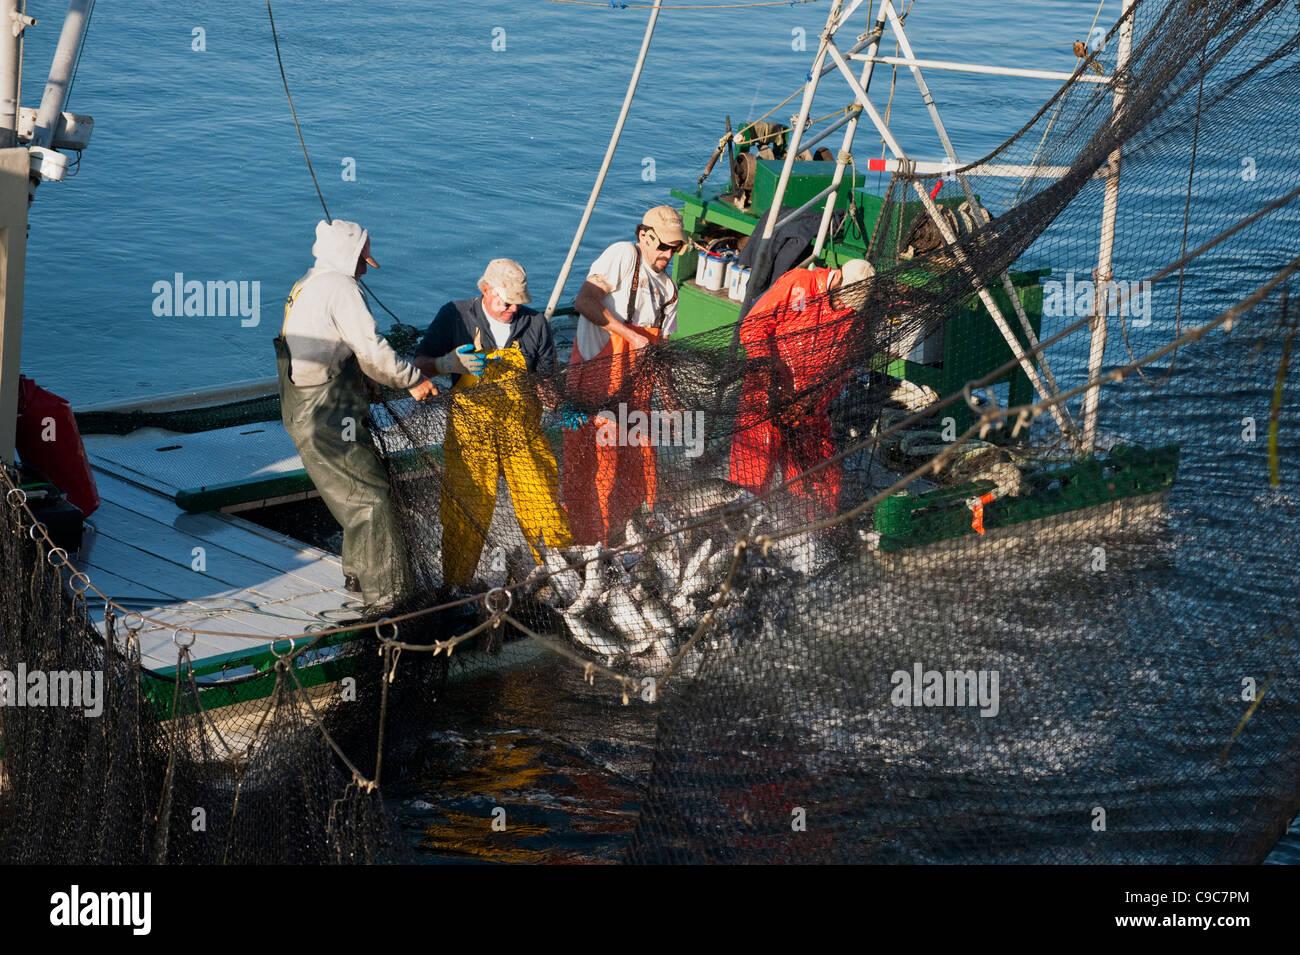 Fishermen on a reefnet salmon fishing boat haul a net full of wild fishermen on a reefnet salmon fishing boat haul a net full of wild pacific salmon into sciox Gallery